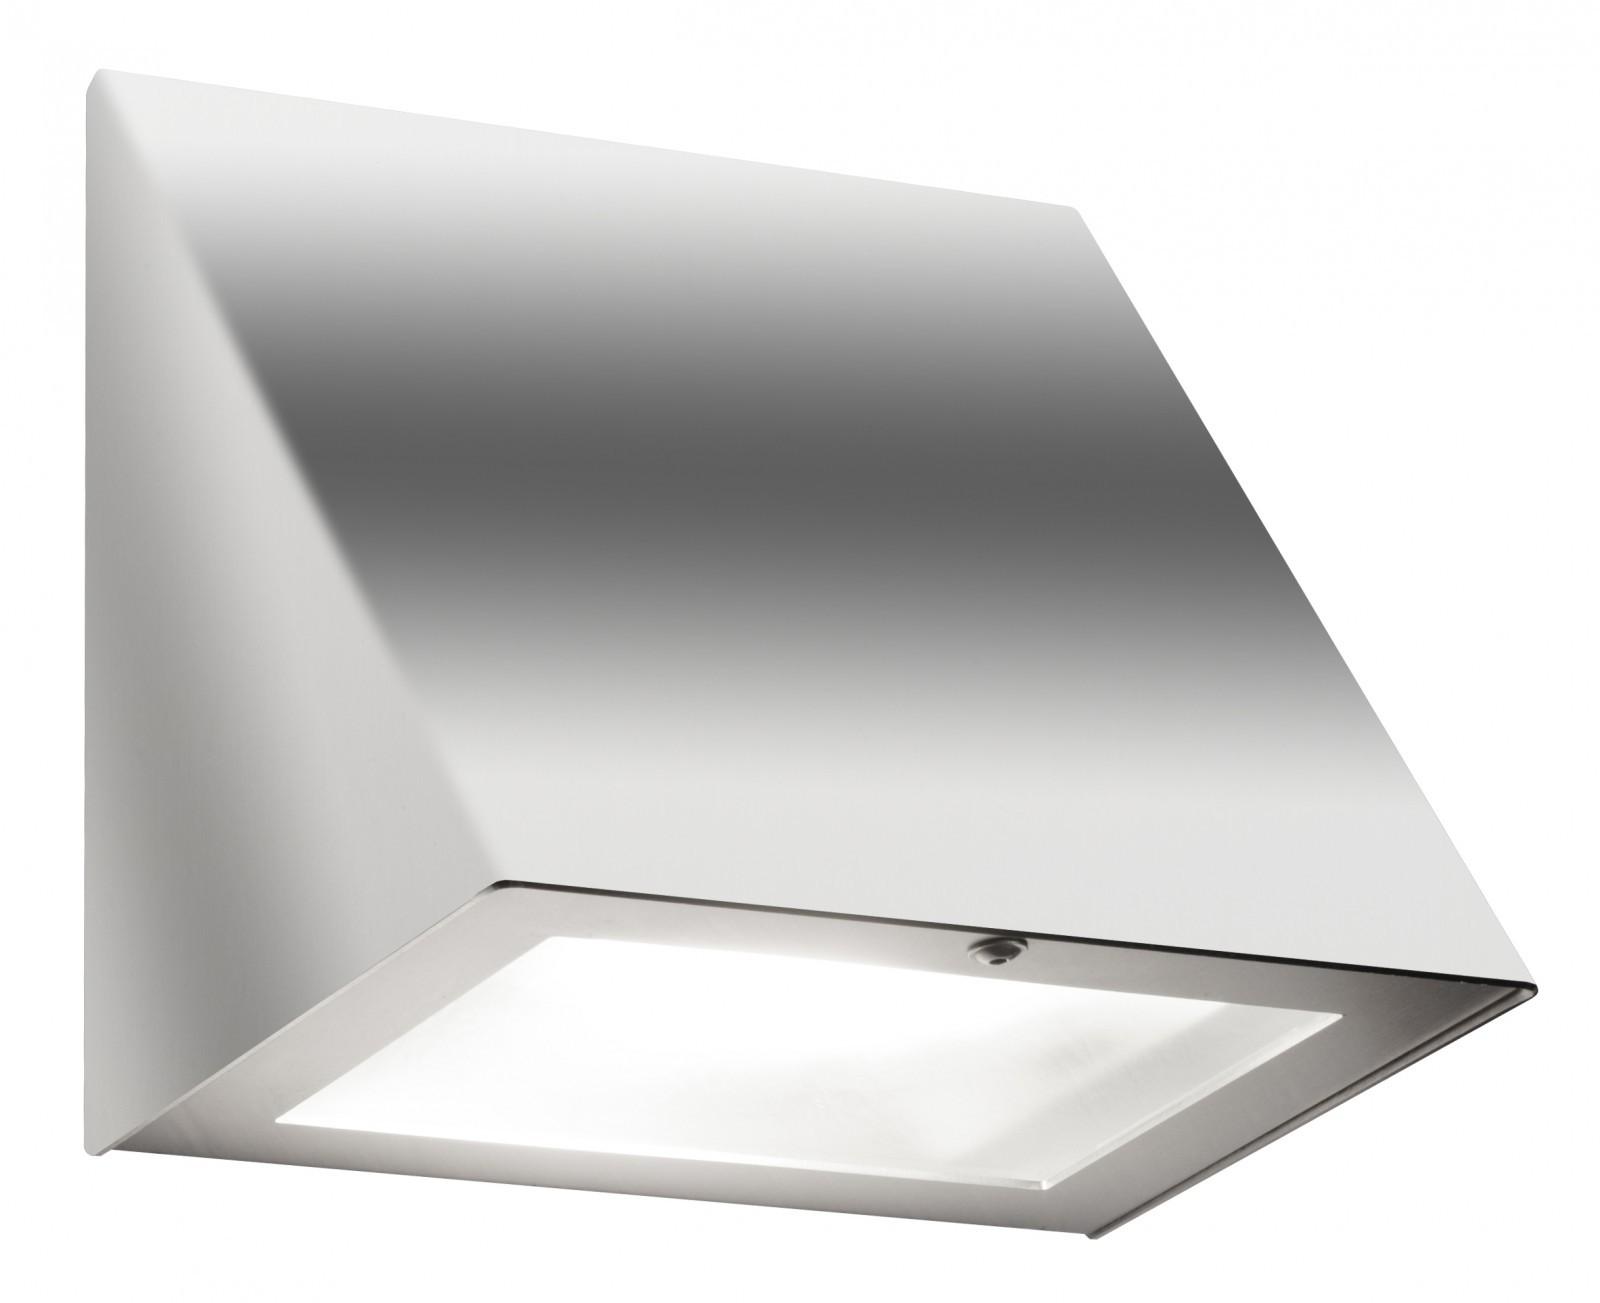 Cmd Edelstahl Led Außenleuchte Wandleuchte Aqua Peso 113 Scharf Metall Design